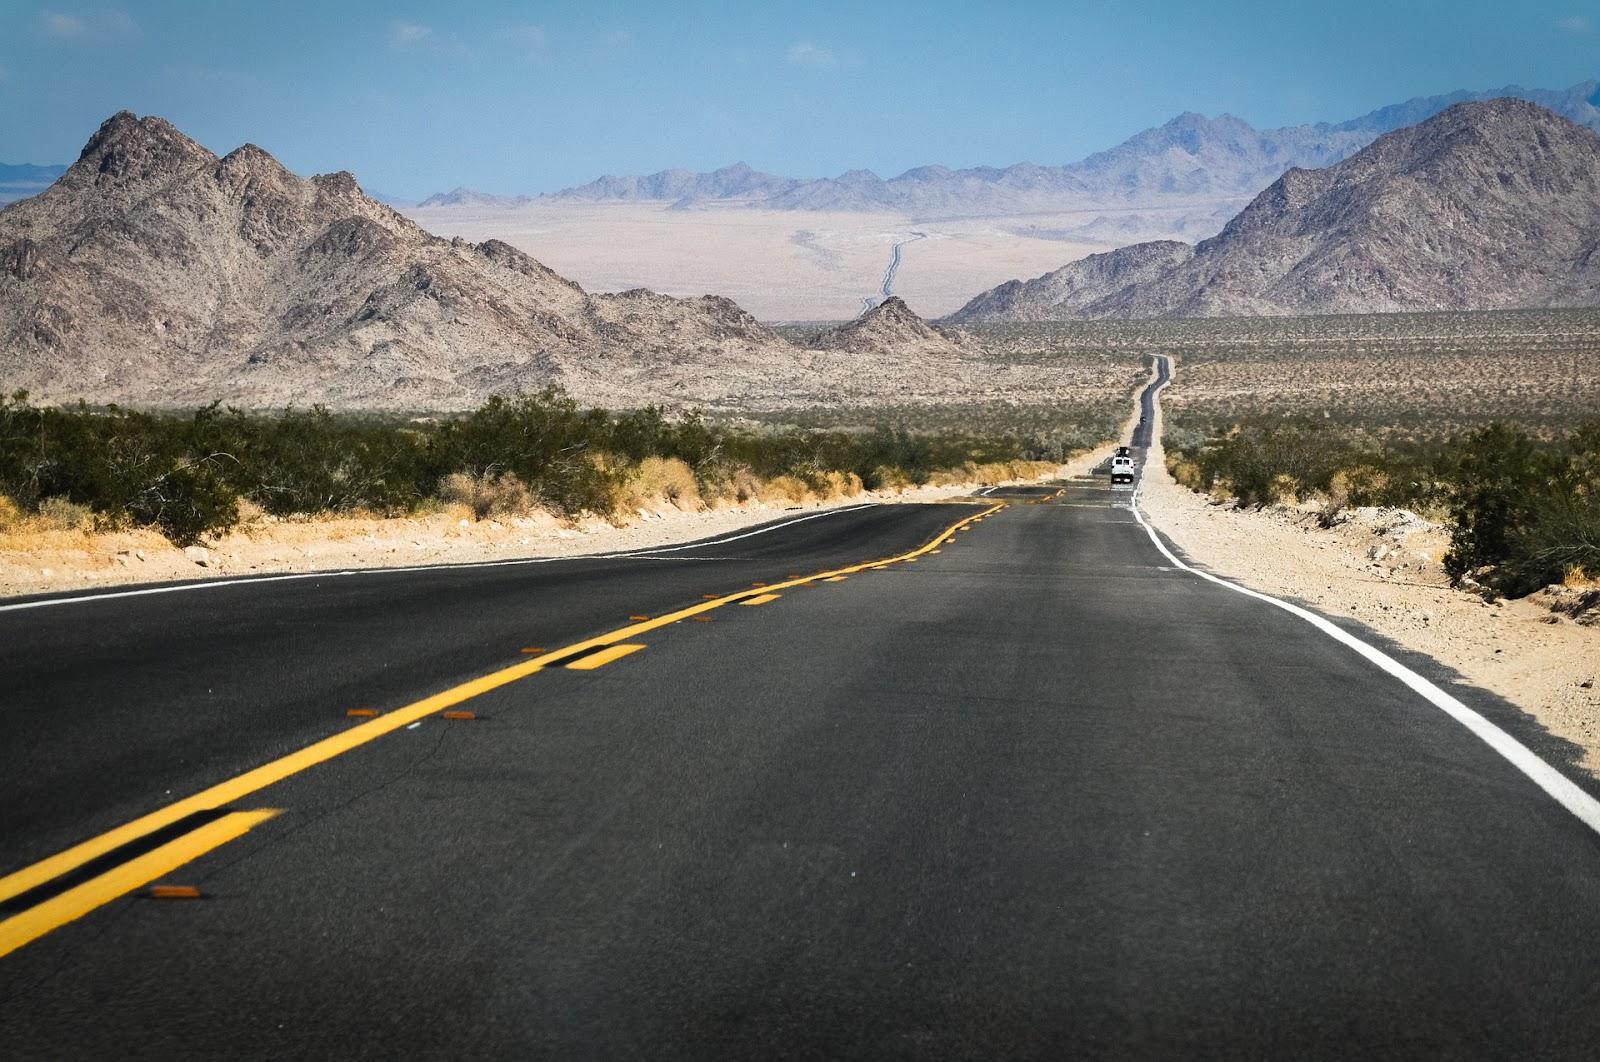 1 van single car on long route 66 in arizona in rural country desert and hills